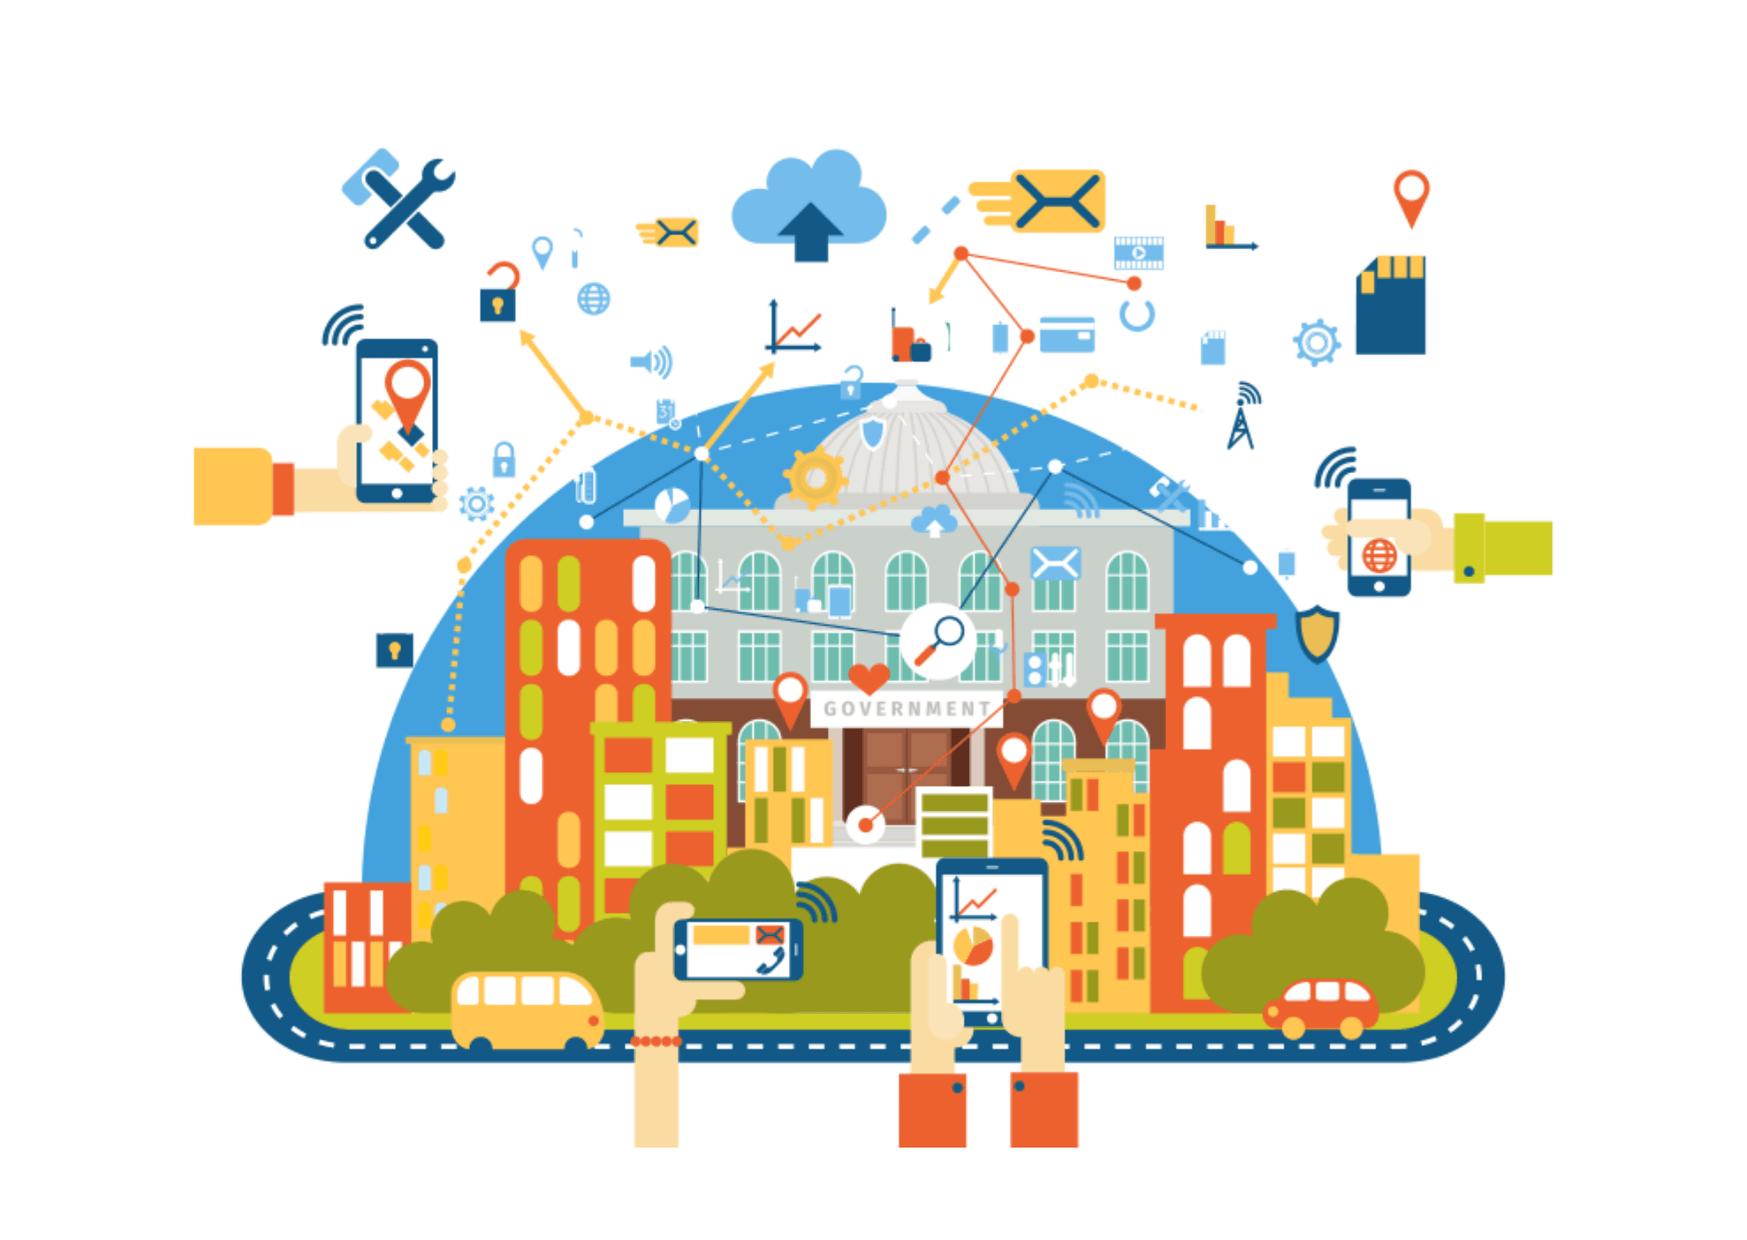 II Международная on-line конференция школьников «Science knowledge — 2020/2021», 10.09.2020-31.08.2021